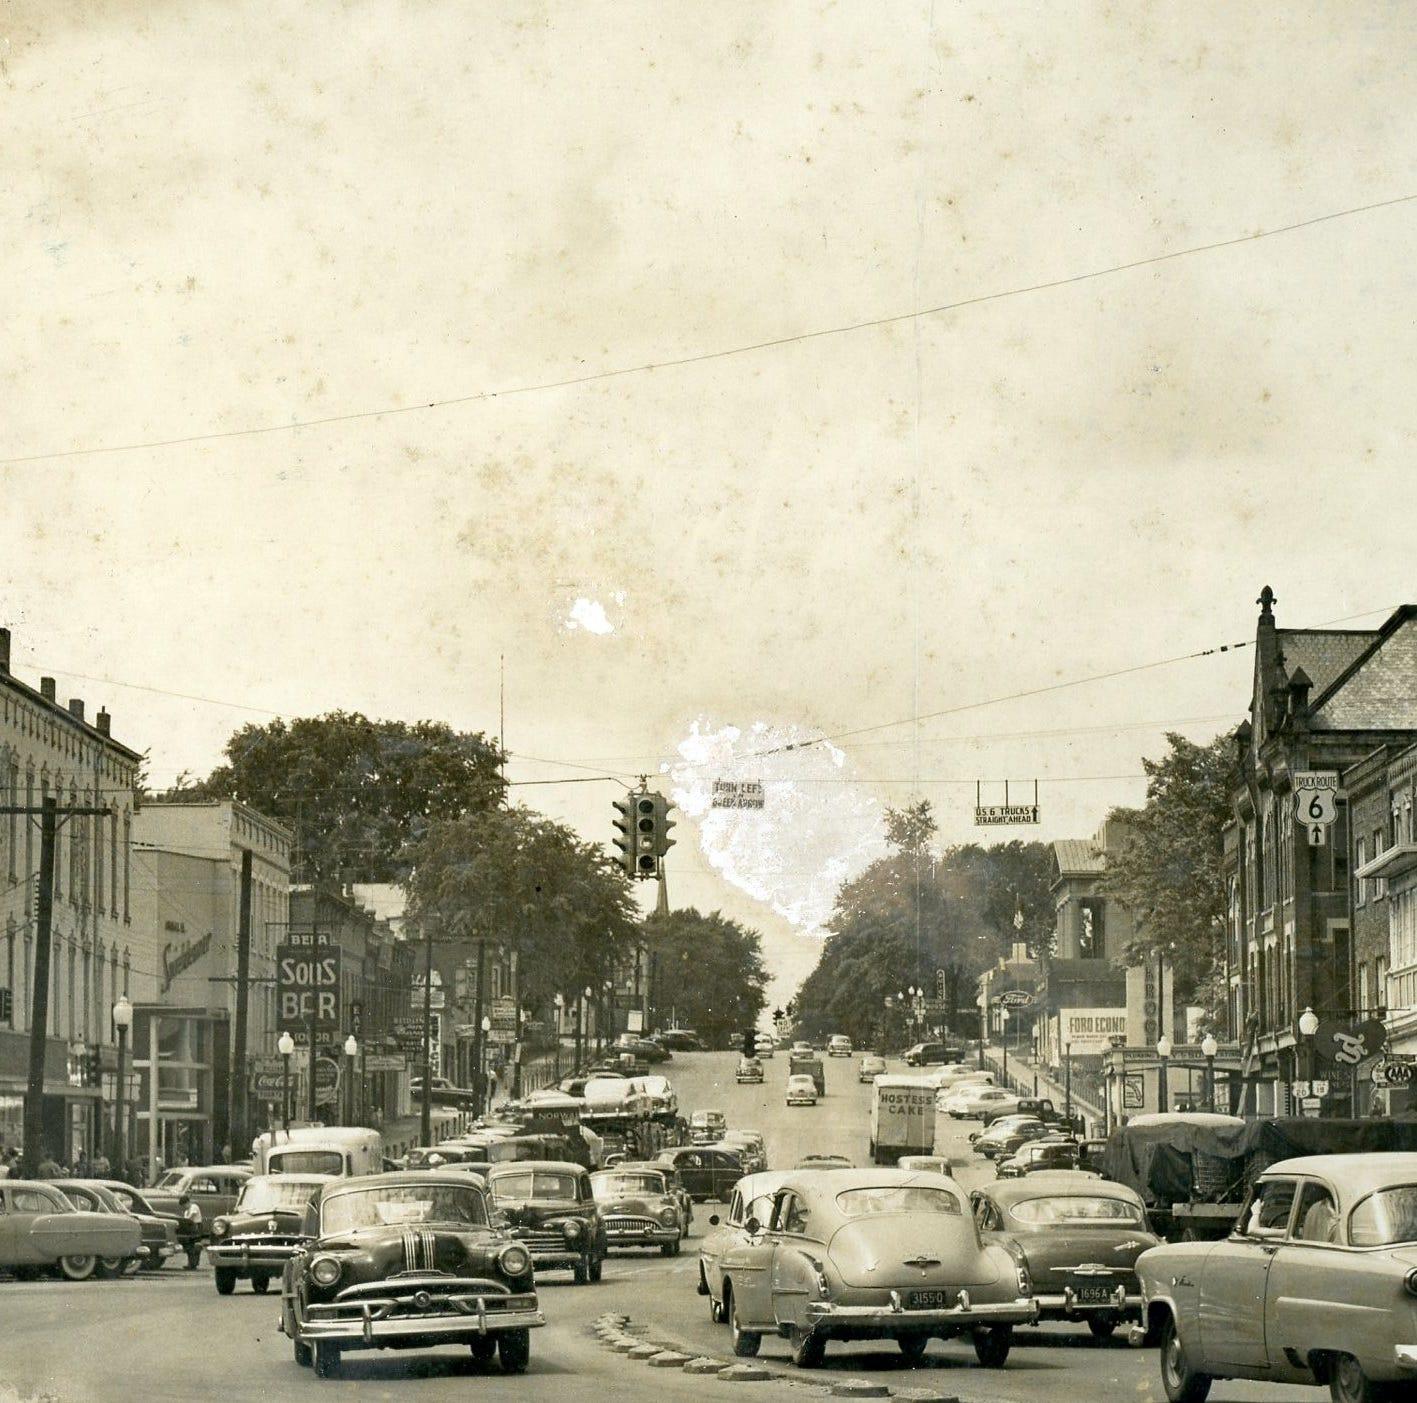 History Spotlight: A 1950s rush hour